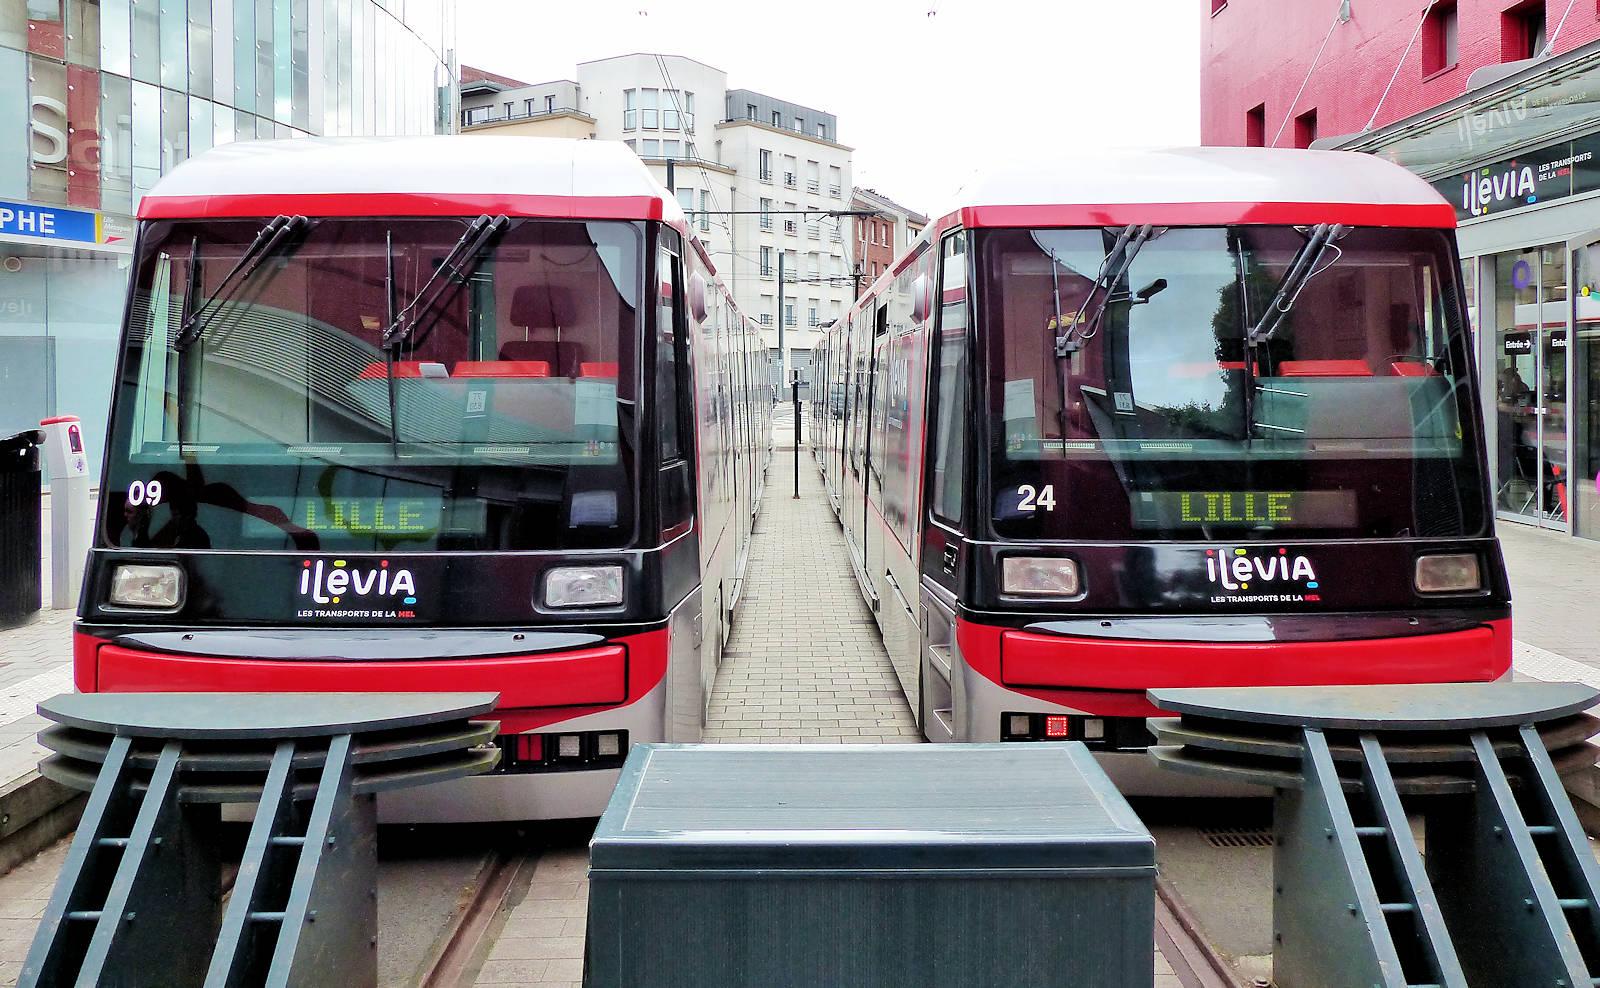 Tourcoing Centre Tram